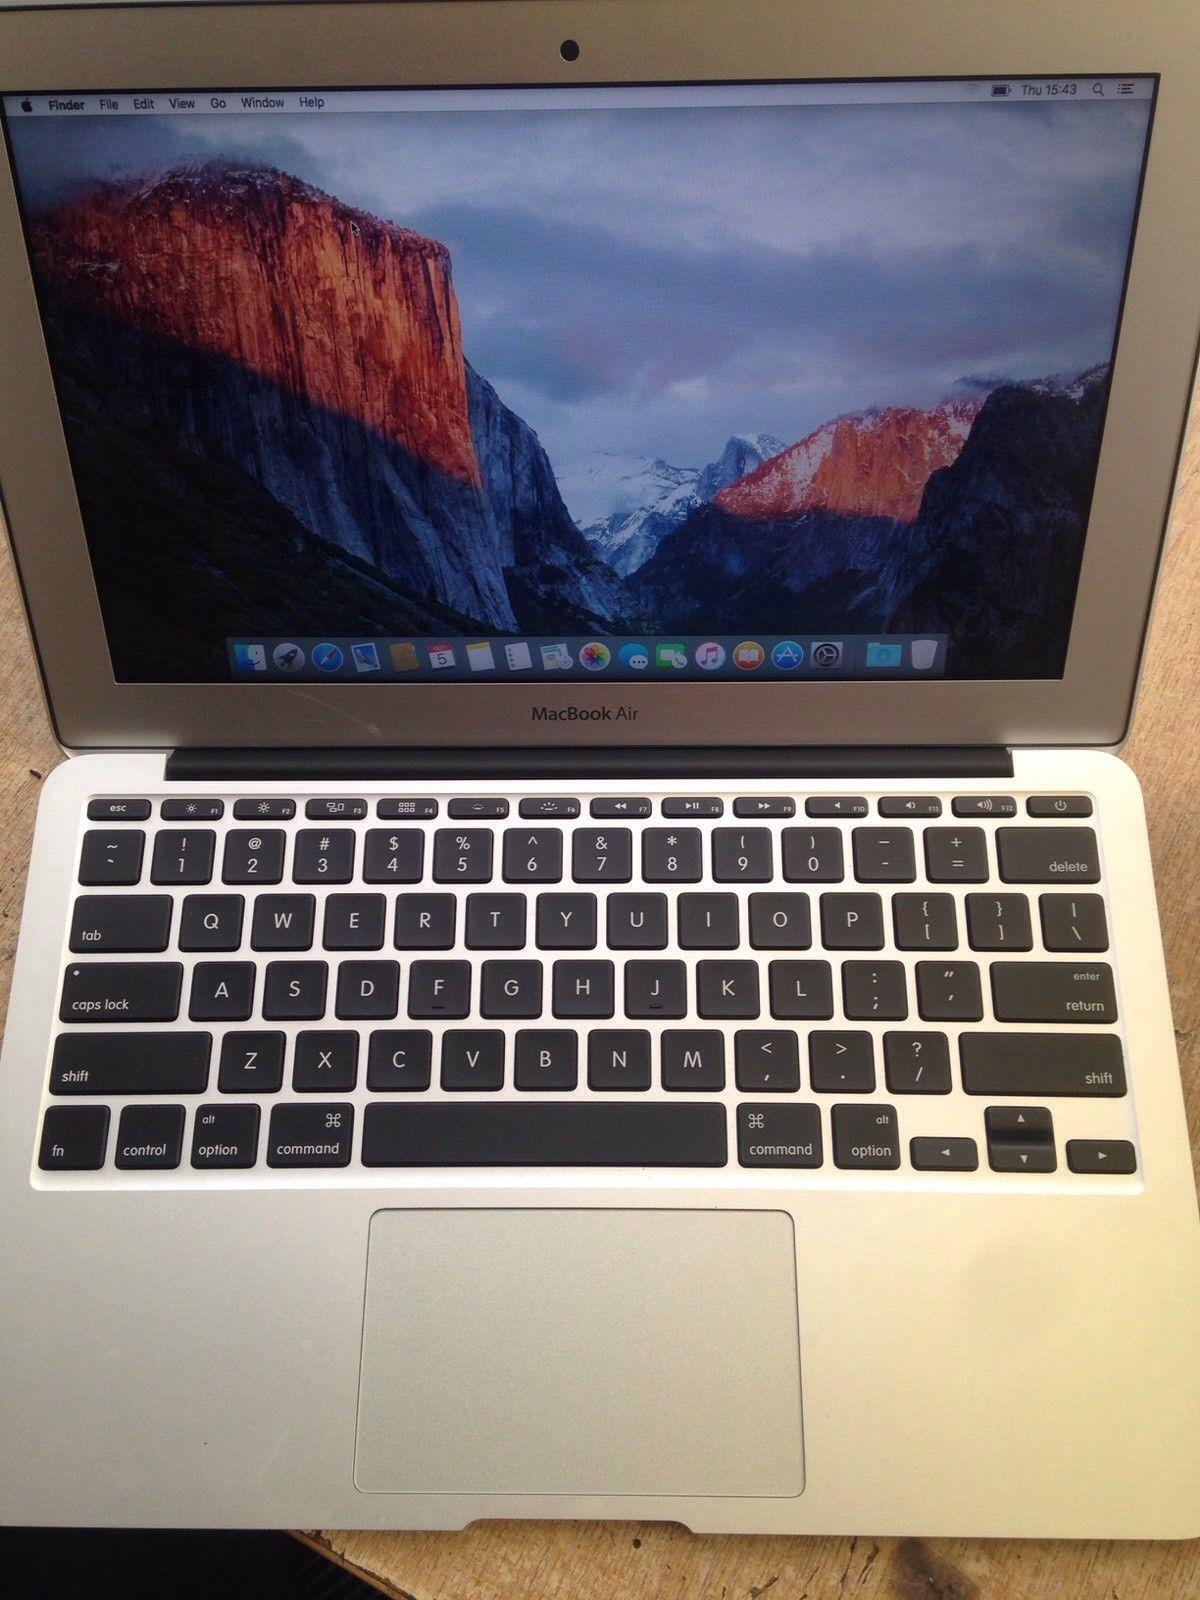 achat apple macbook air a1465 11 laptop mjvm2b a early. Black Bedroom Furniture Sets. Home Design Ideas